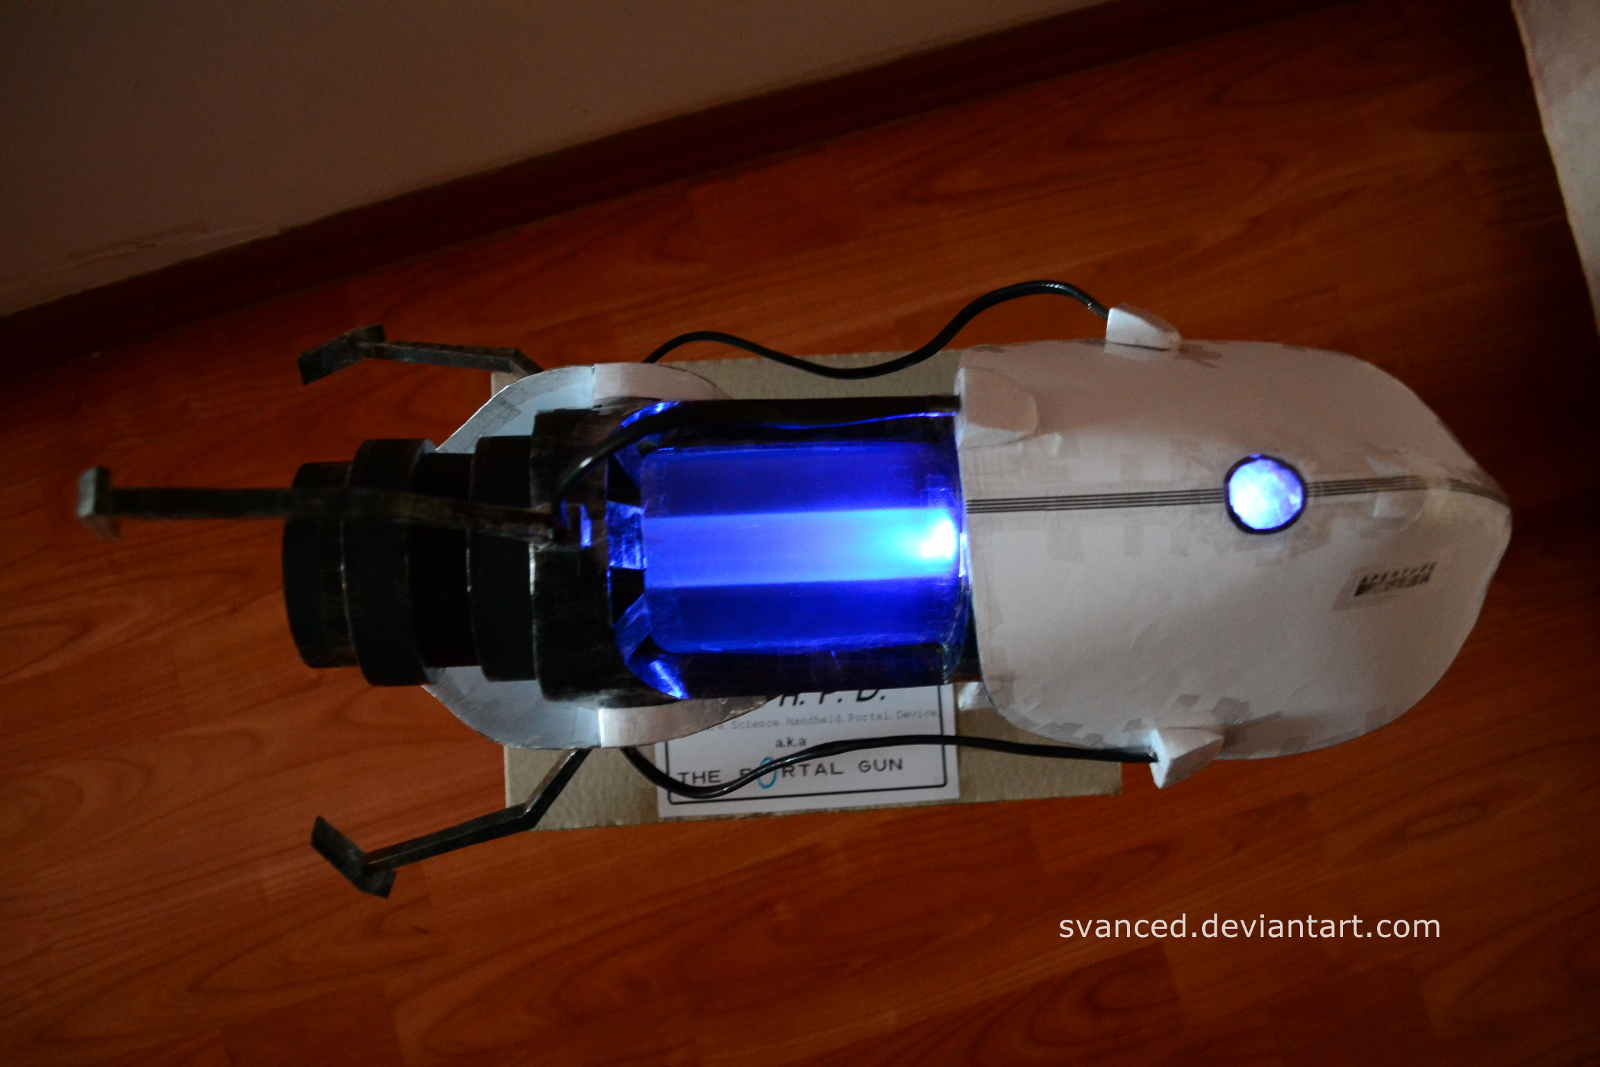 Portal Gun Papercraft 3 By Svanced By Svanced On Deviantart